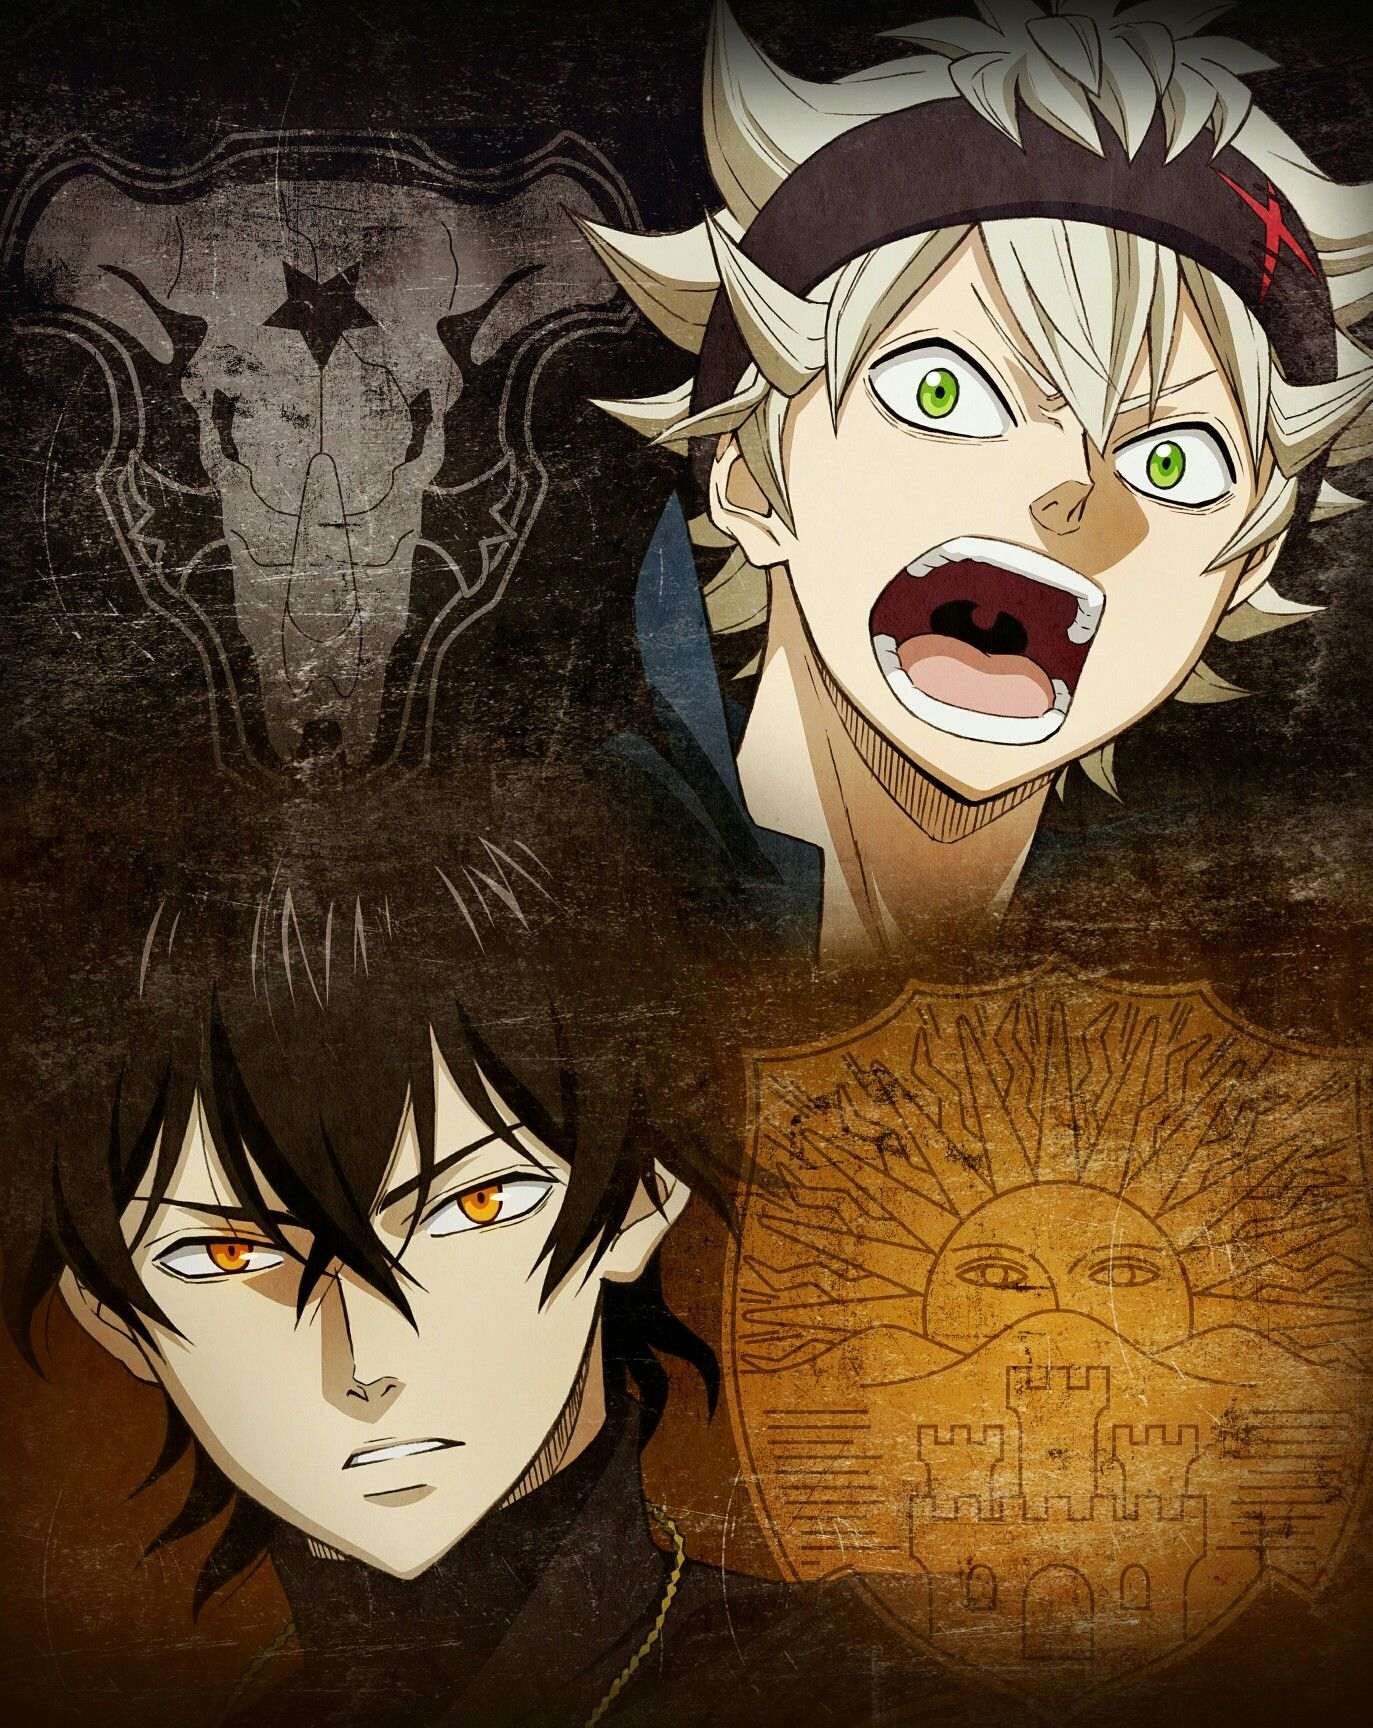 Asta e Yuno Black Clover black clover Animes manga